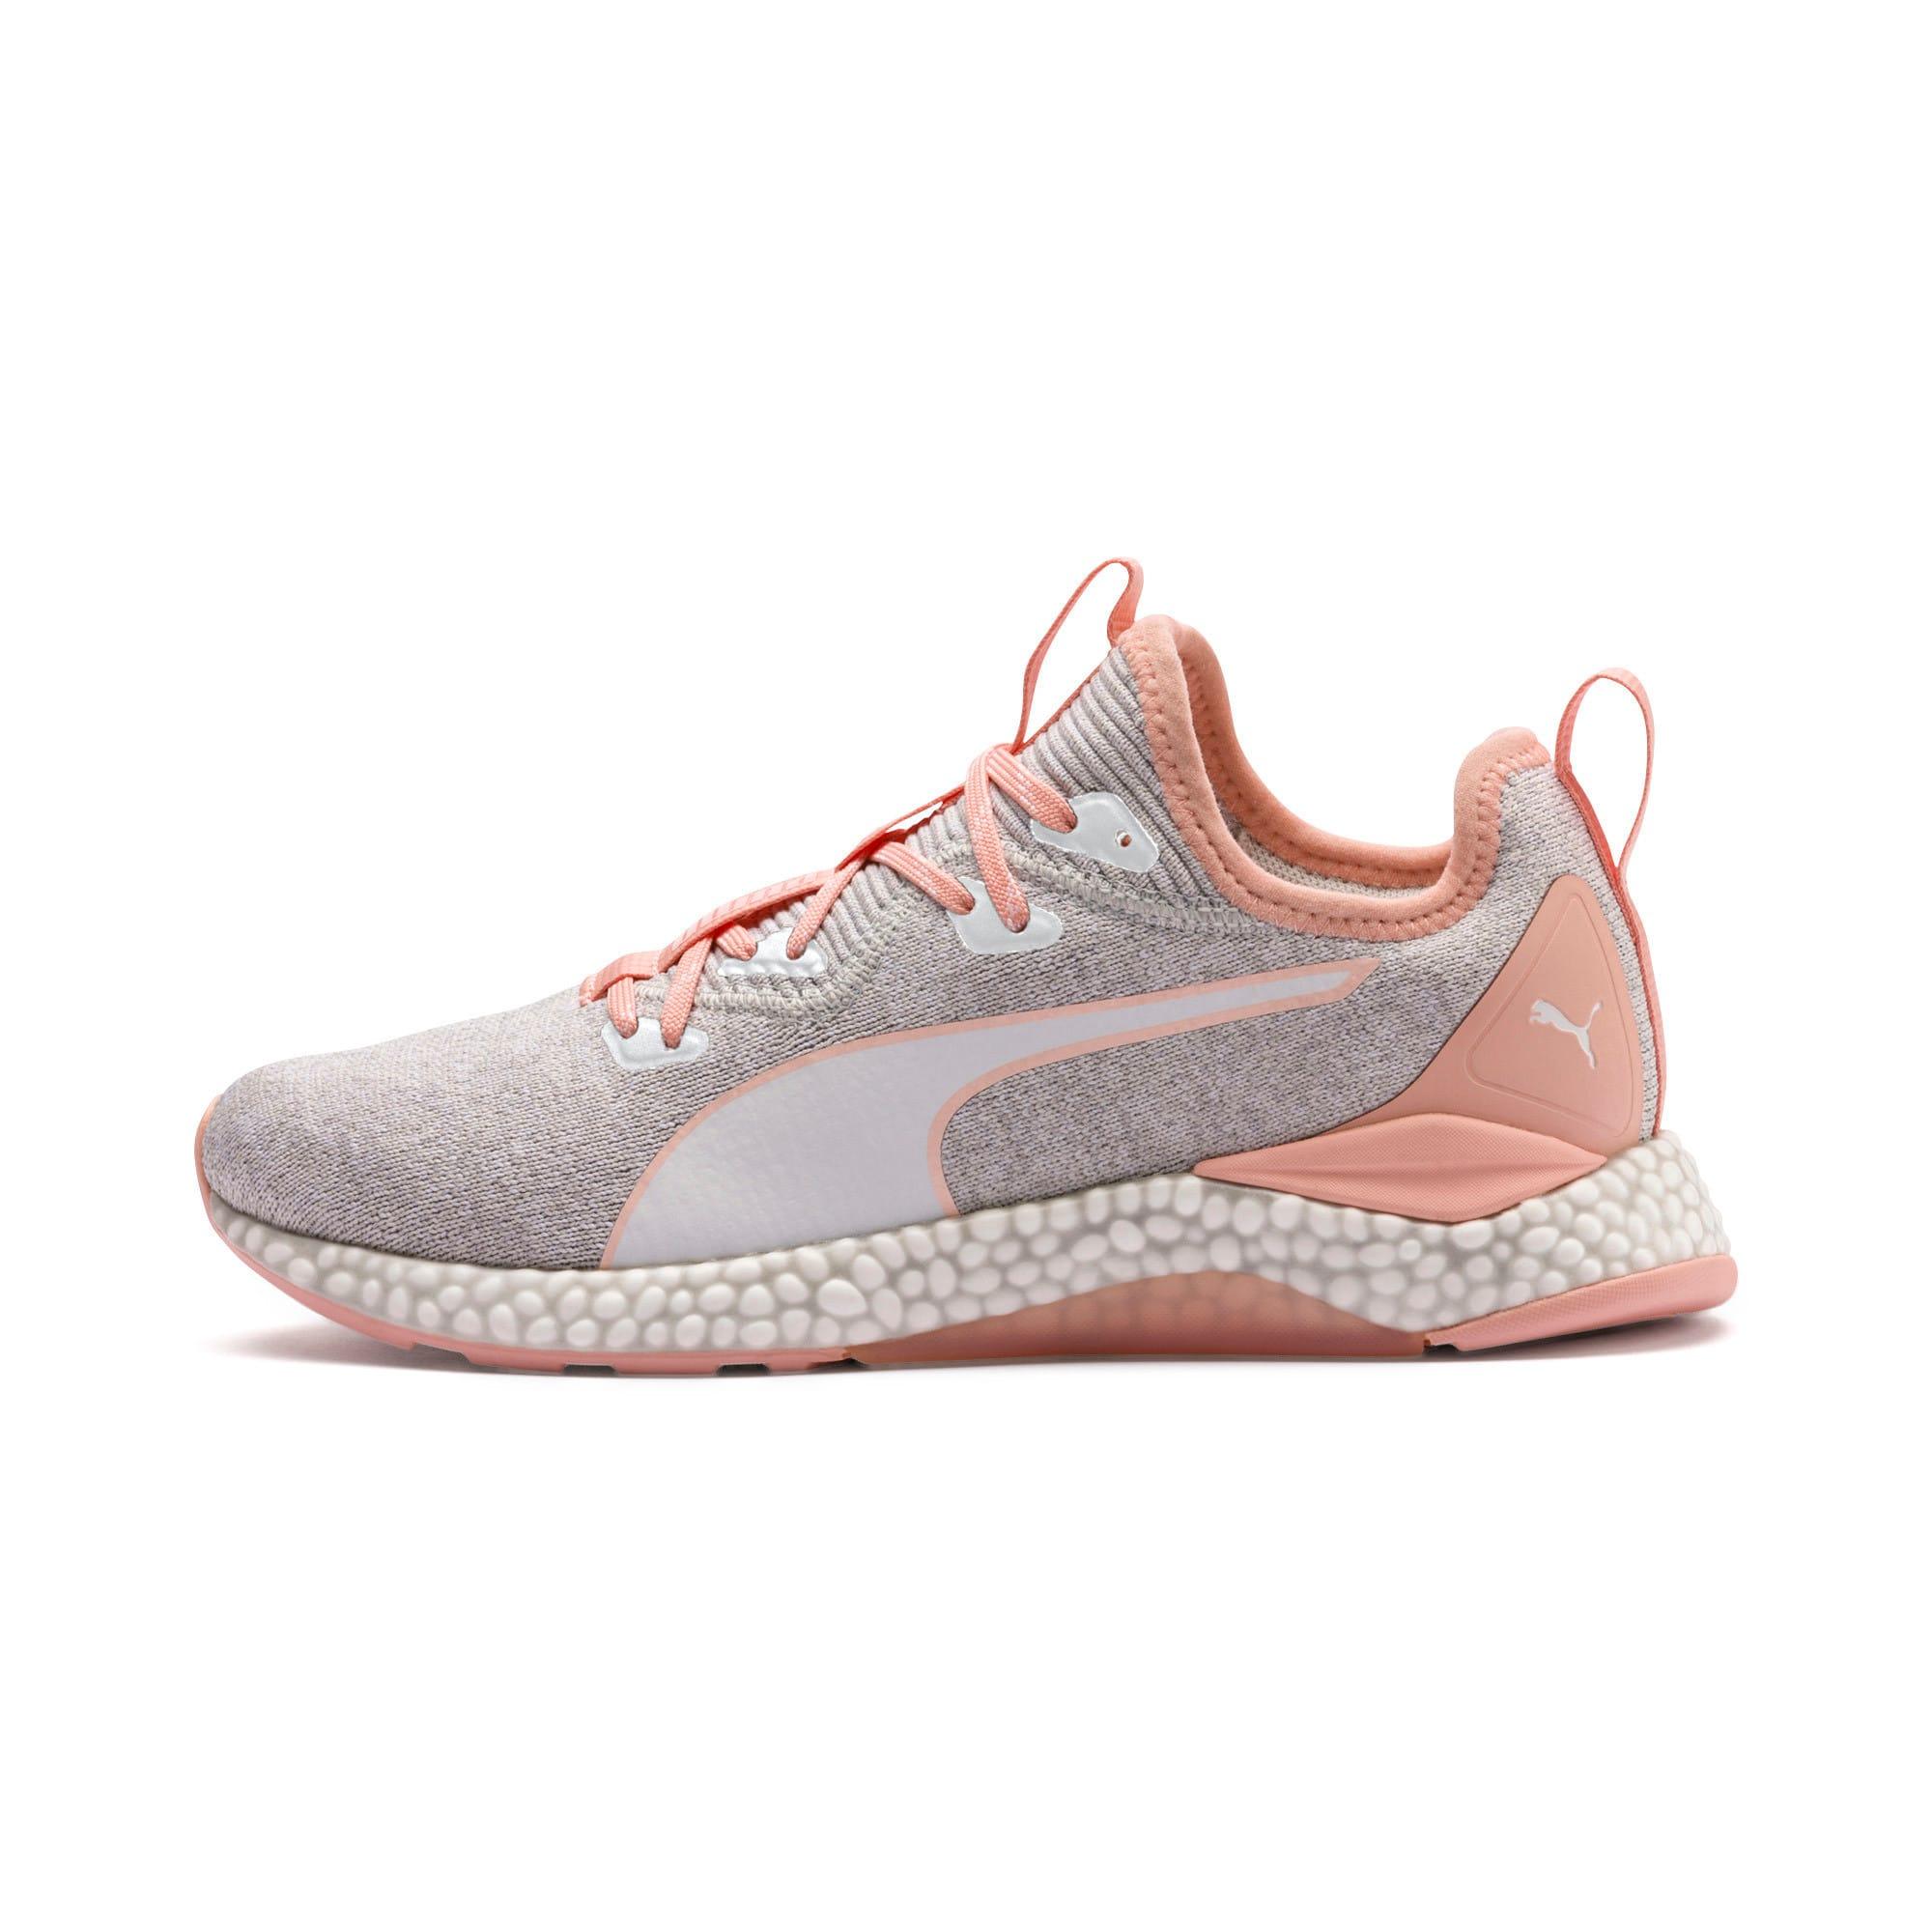 Thumbnail 1 of HYBRID Runner Women's Running Shoes, Glacier Gray-Peach Bud, medium